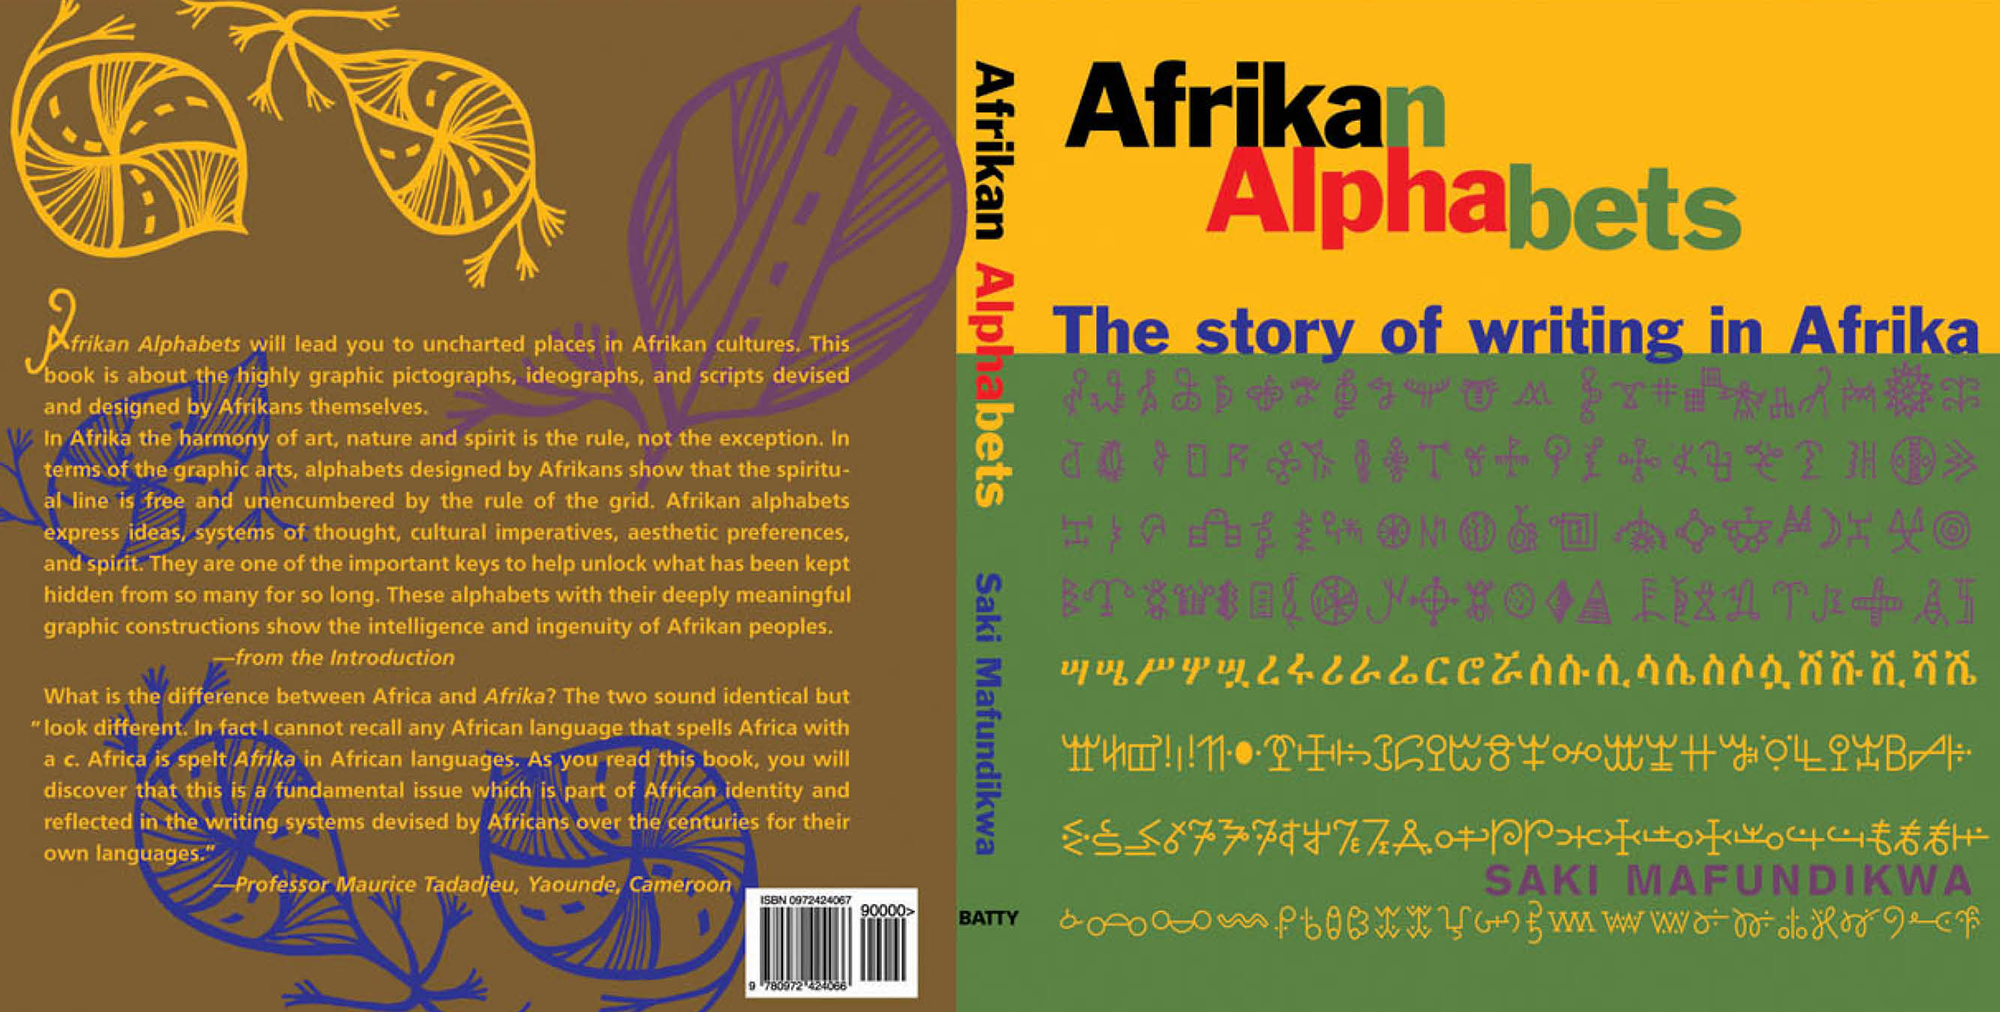 Afrikan Alphabets